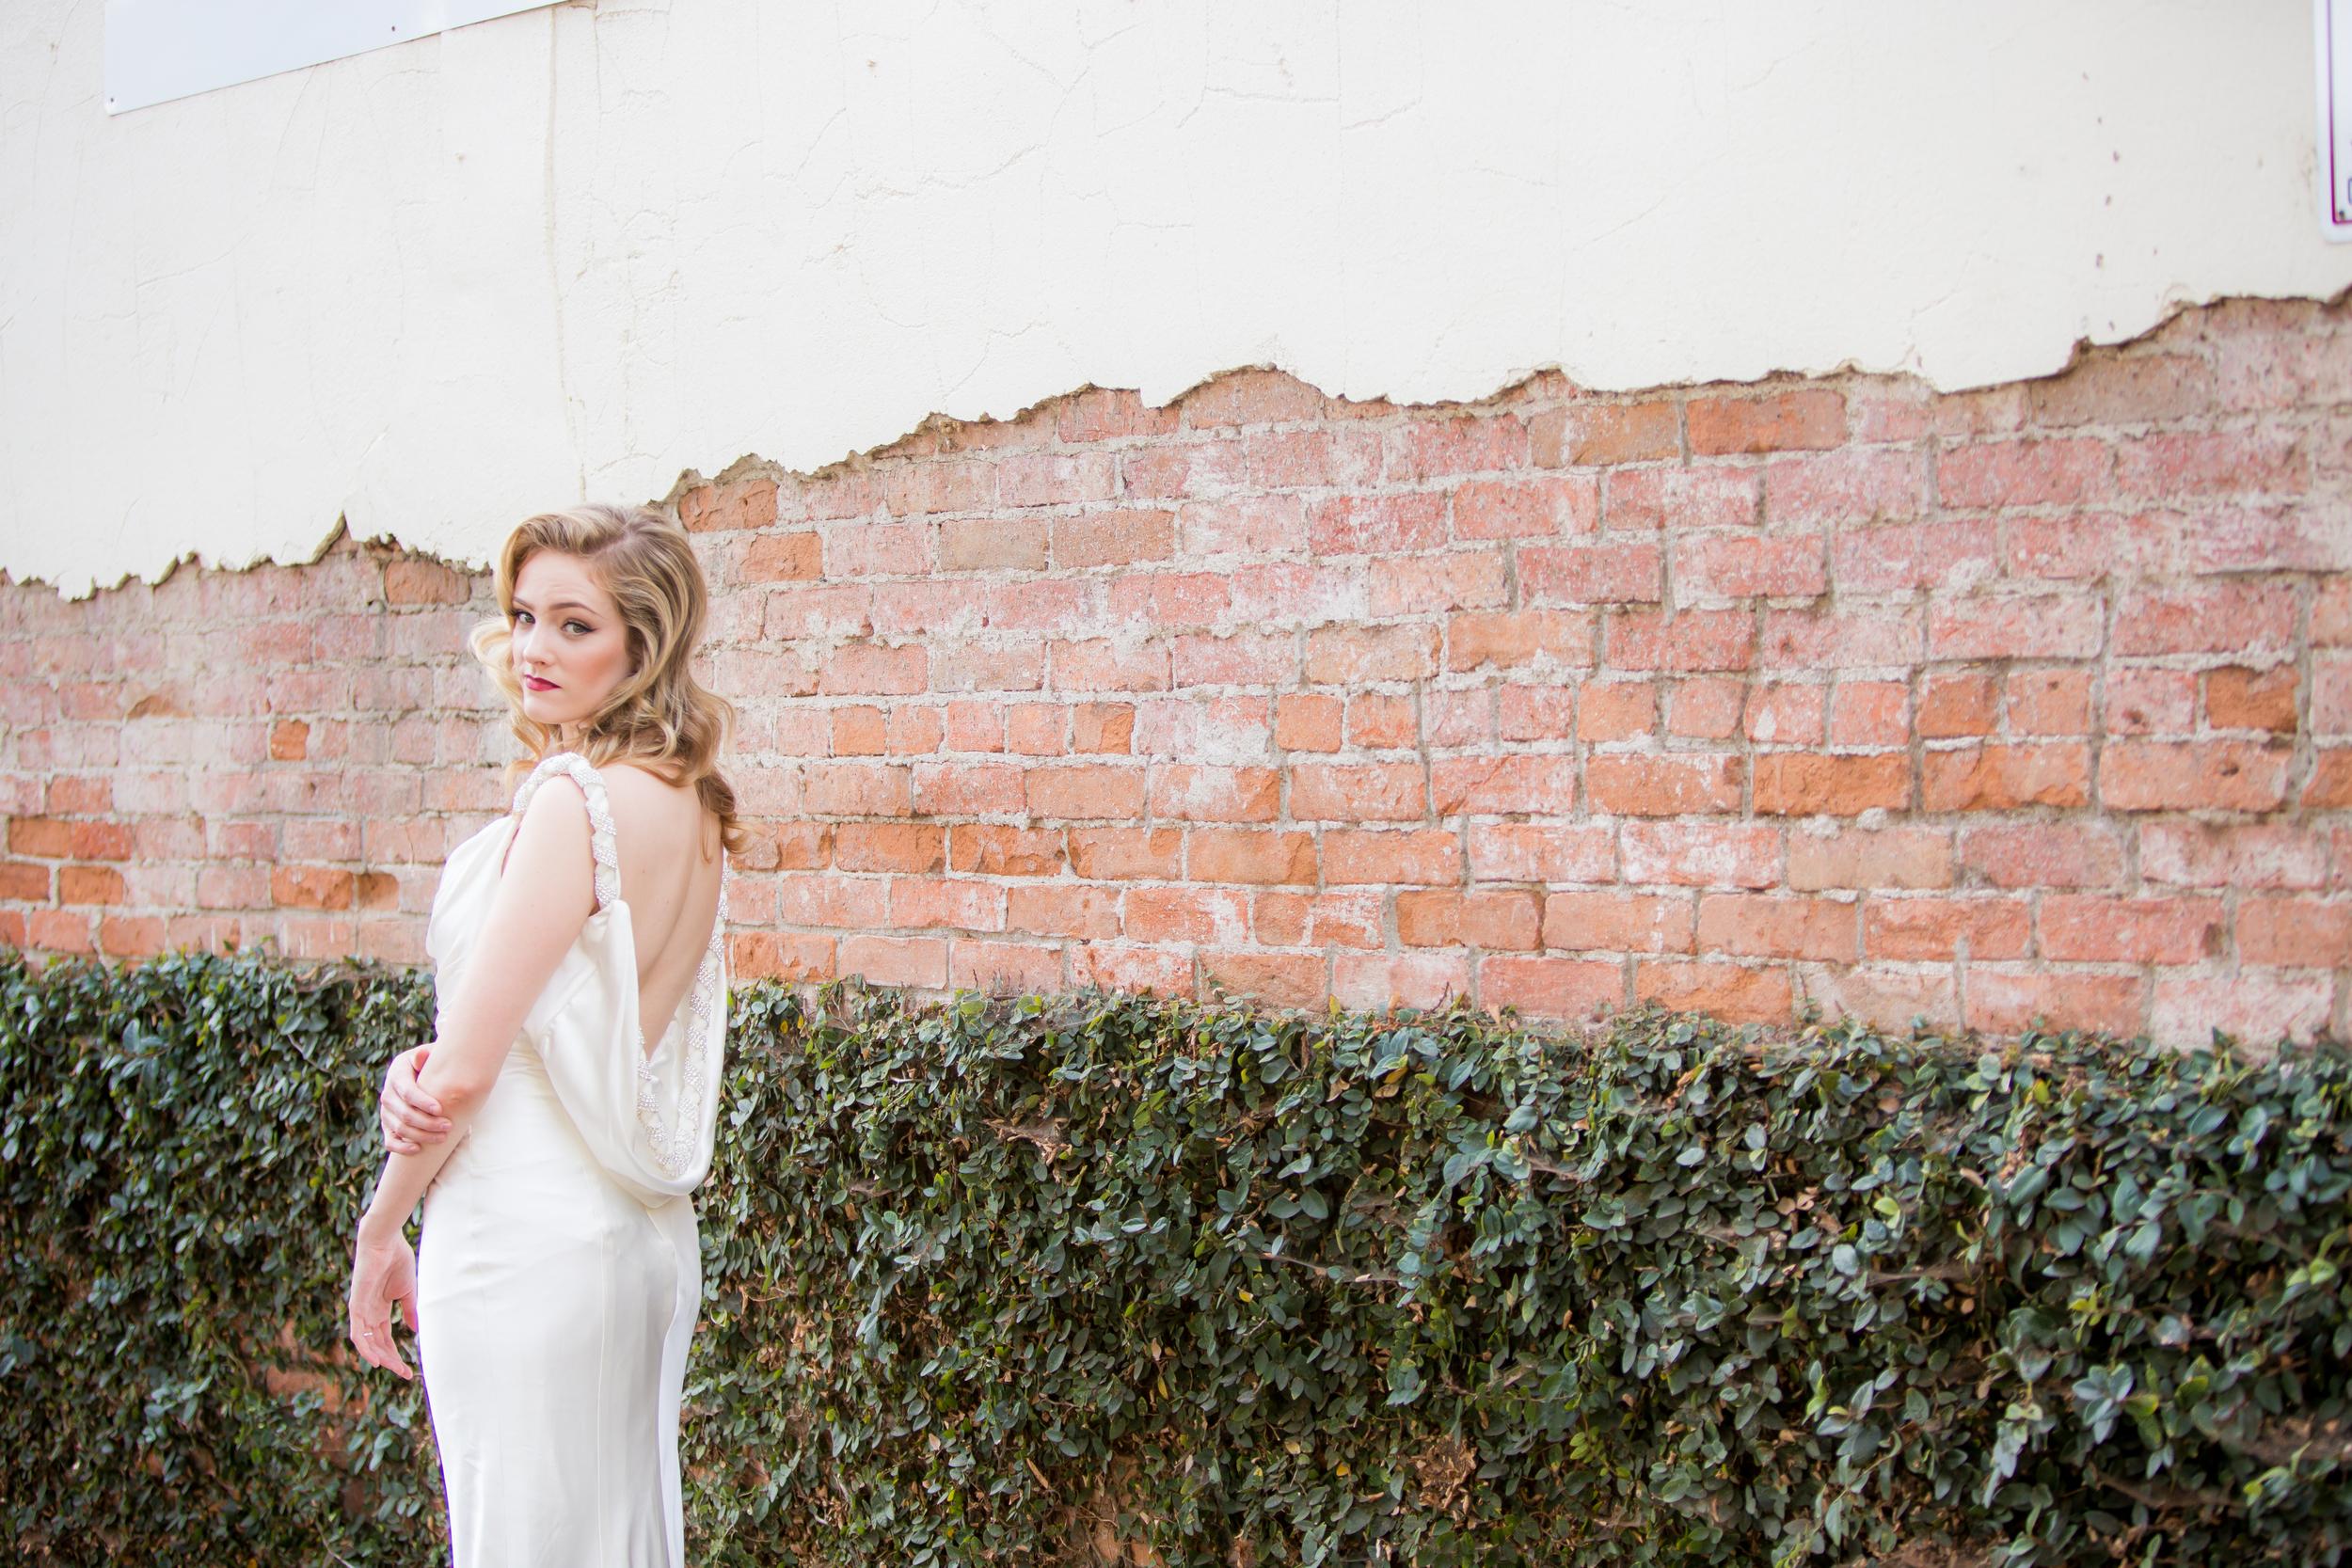 Theresa Bridget Photography // Dress: Love & Lace Bridal Salon